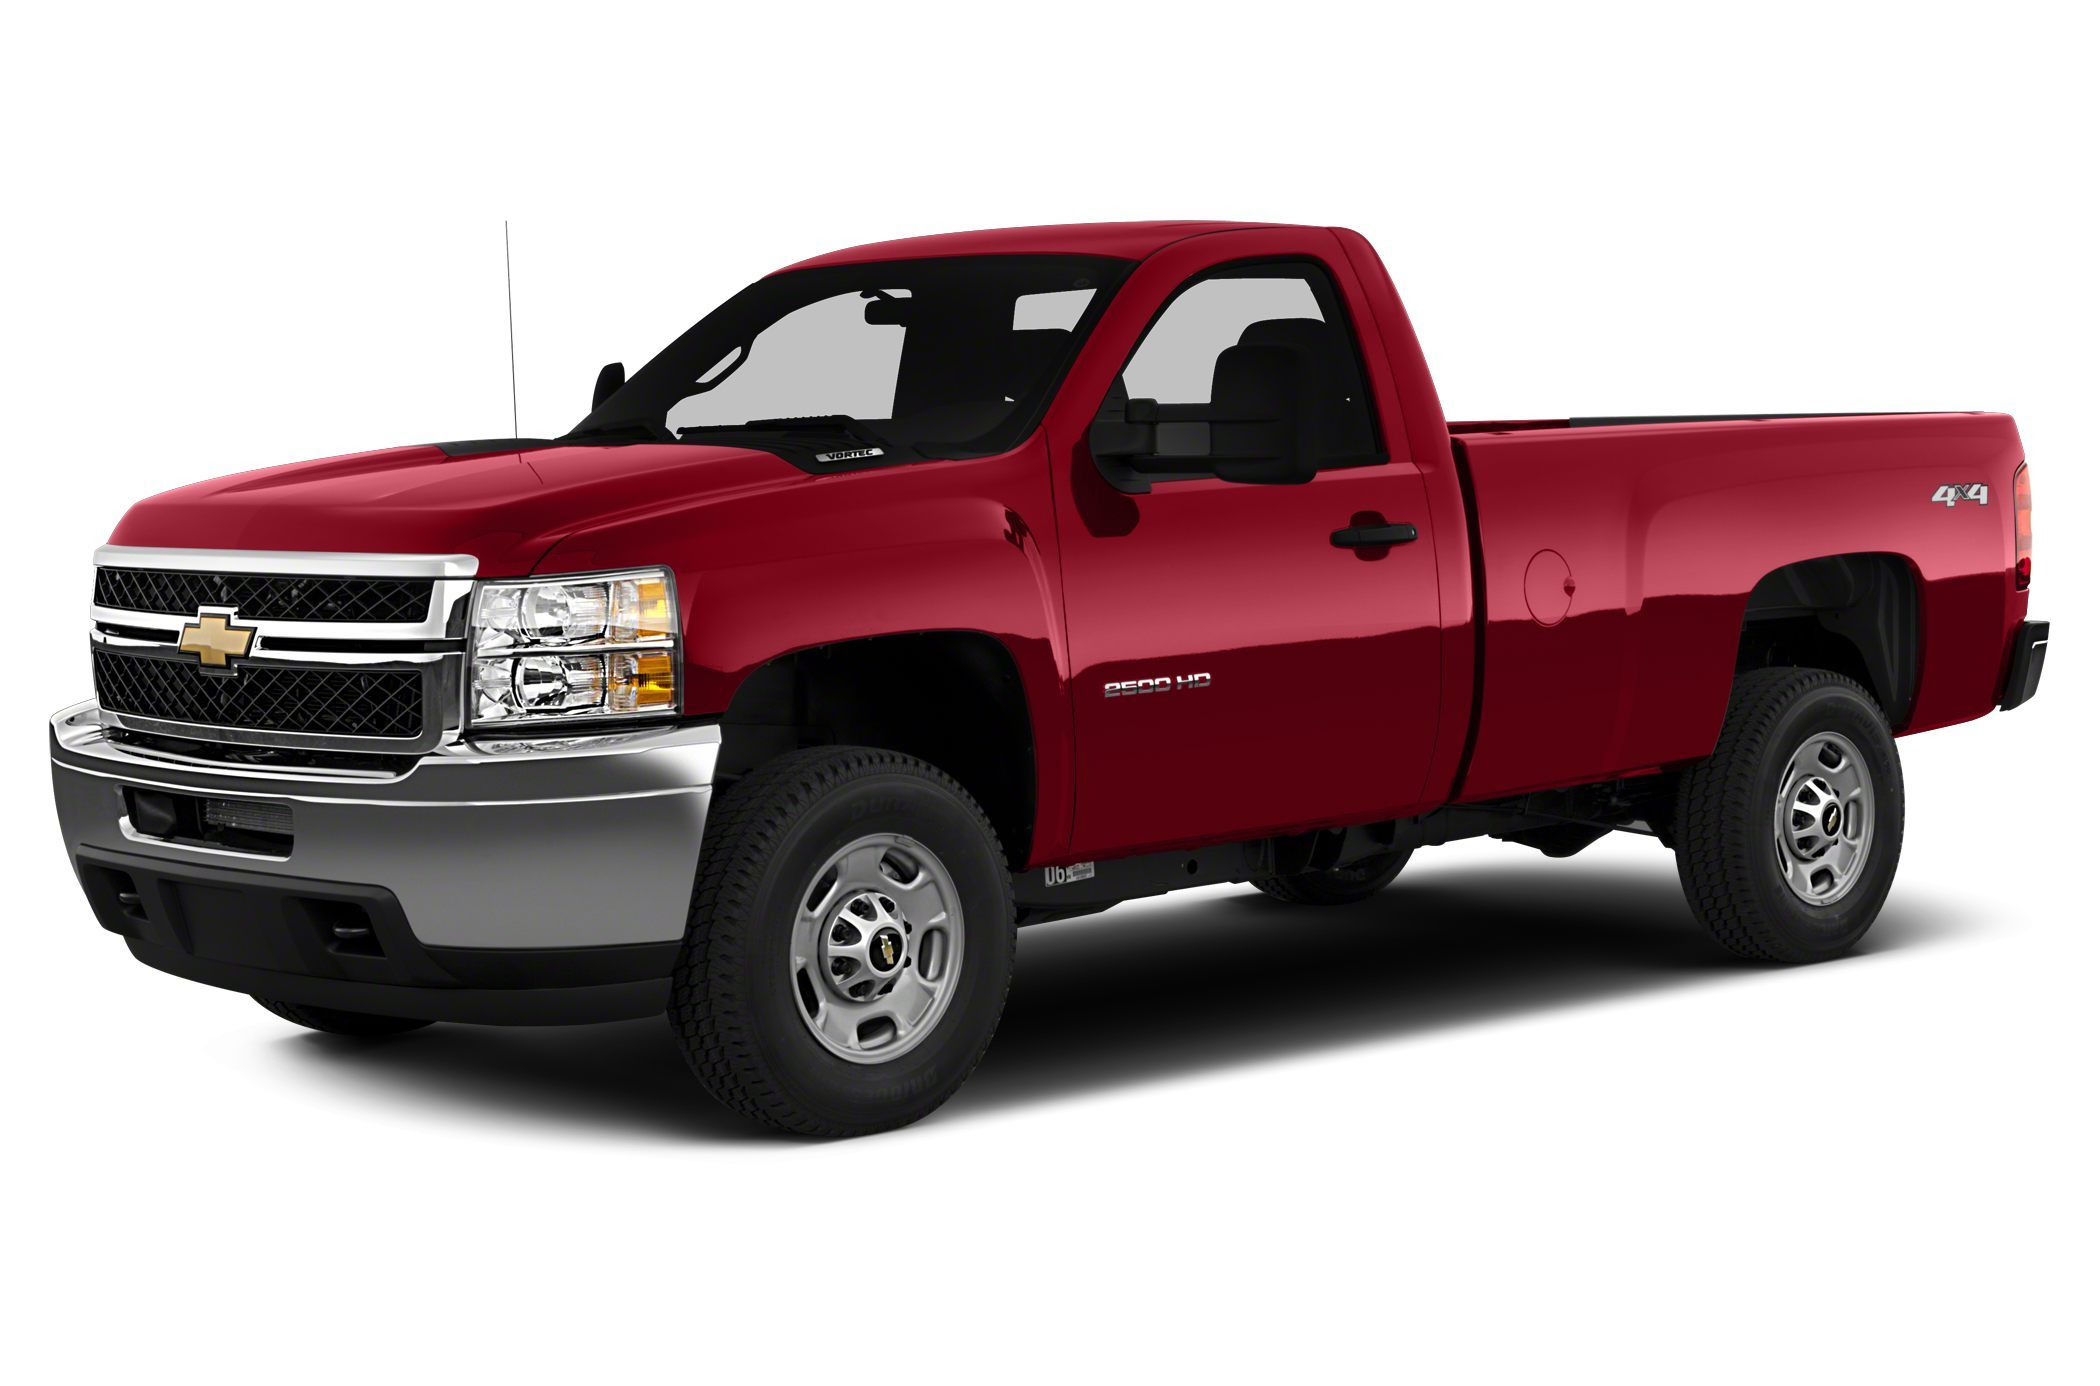 Red 2014 Chevrolet 3500 HD Truck Chevrolet silverado